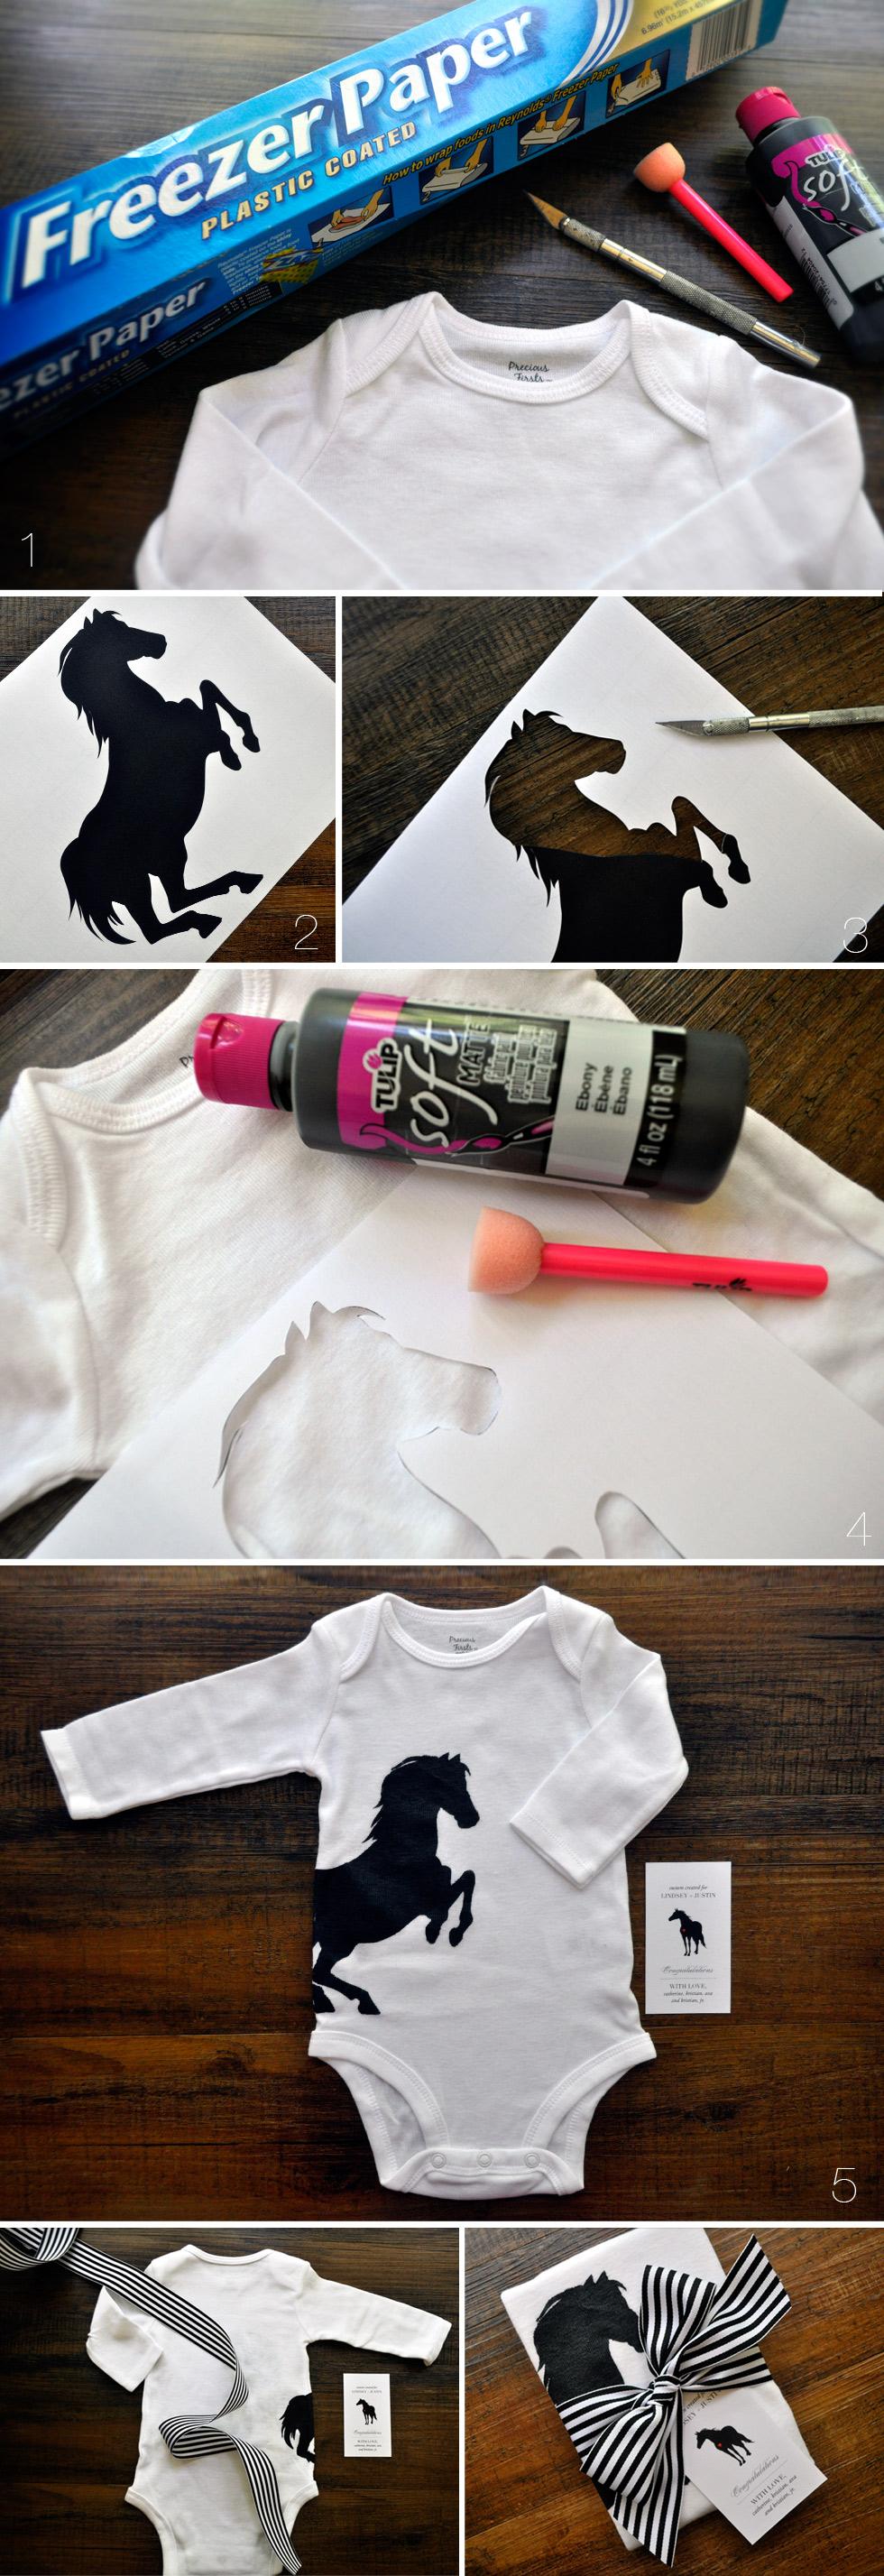 freezer-paper-onesie.jpg